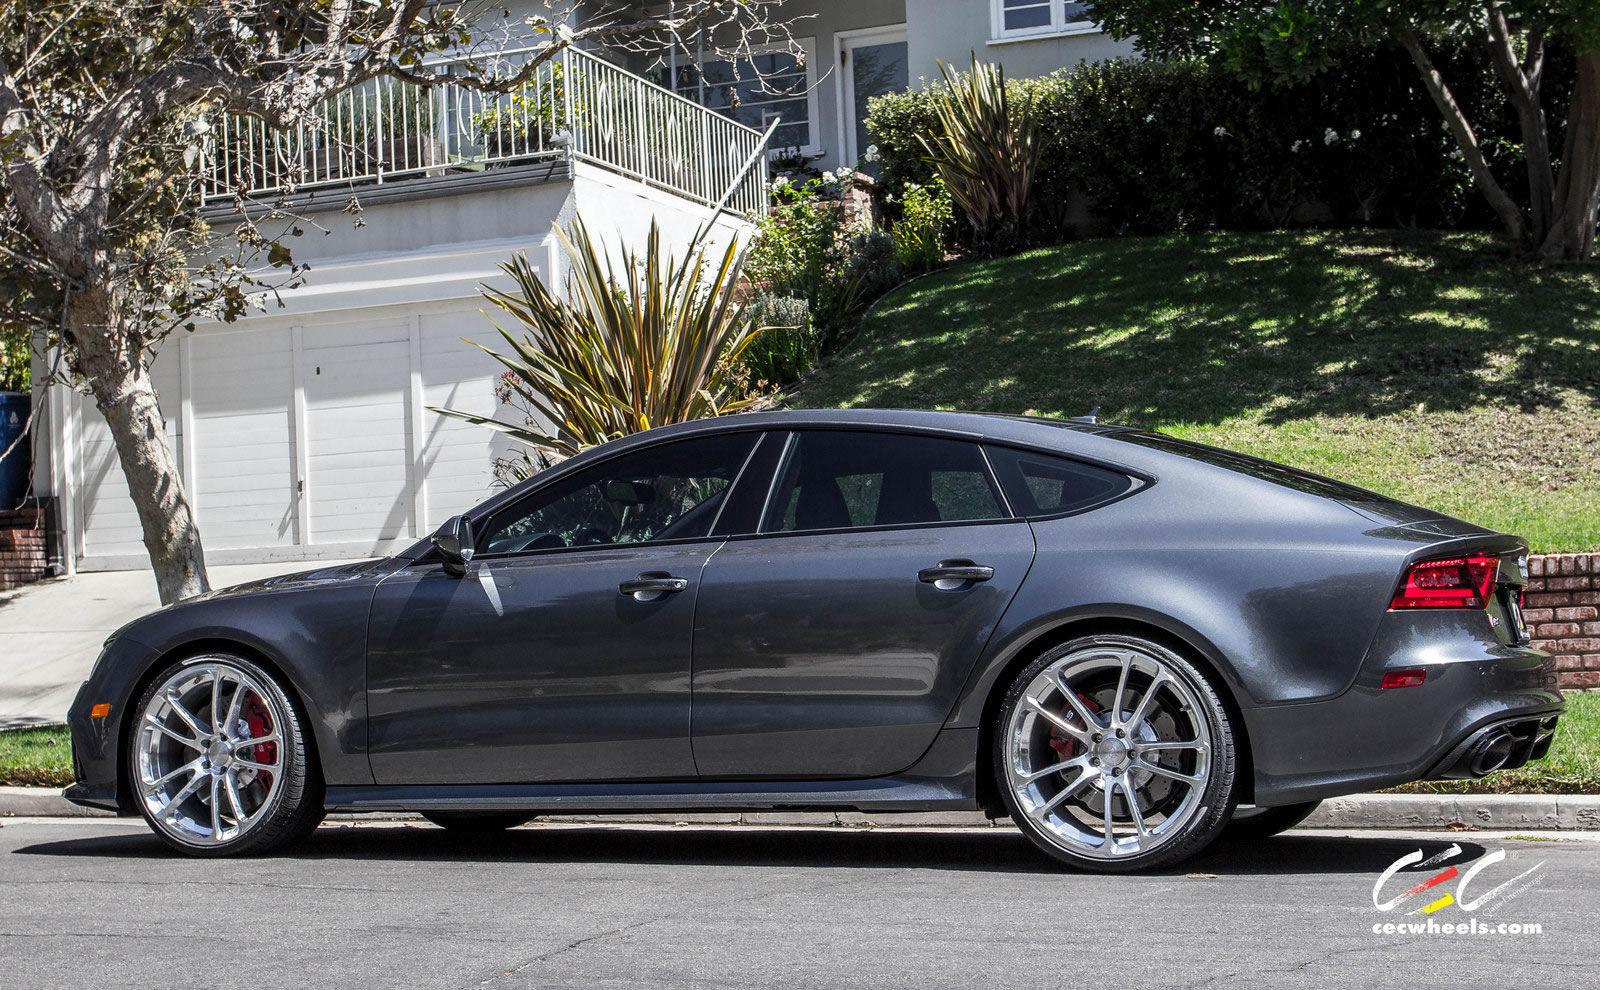 Audi RS7 | Audi RS7 on CEC Wheels